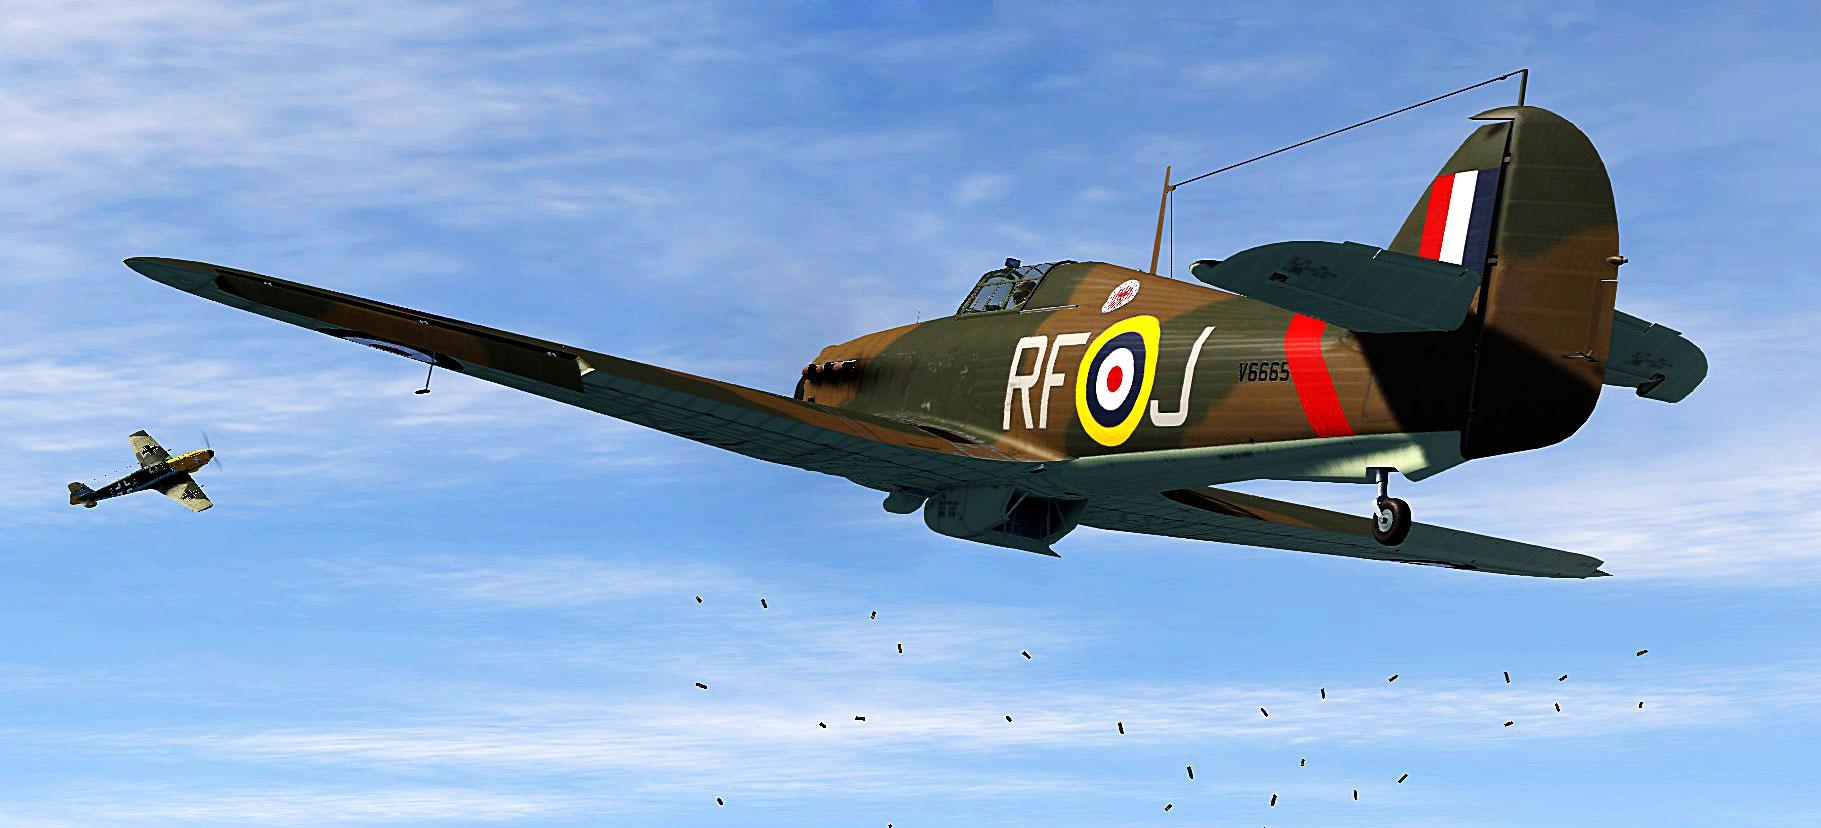 Hurricane I RAF 303Sqn RFJ John Kent V6665 tries to nail a Me 109 over England V01